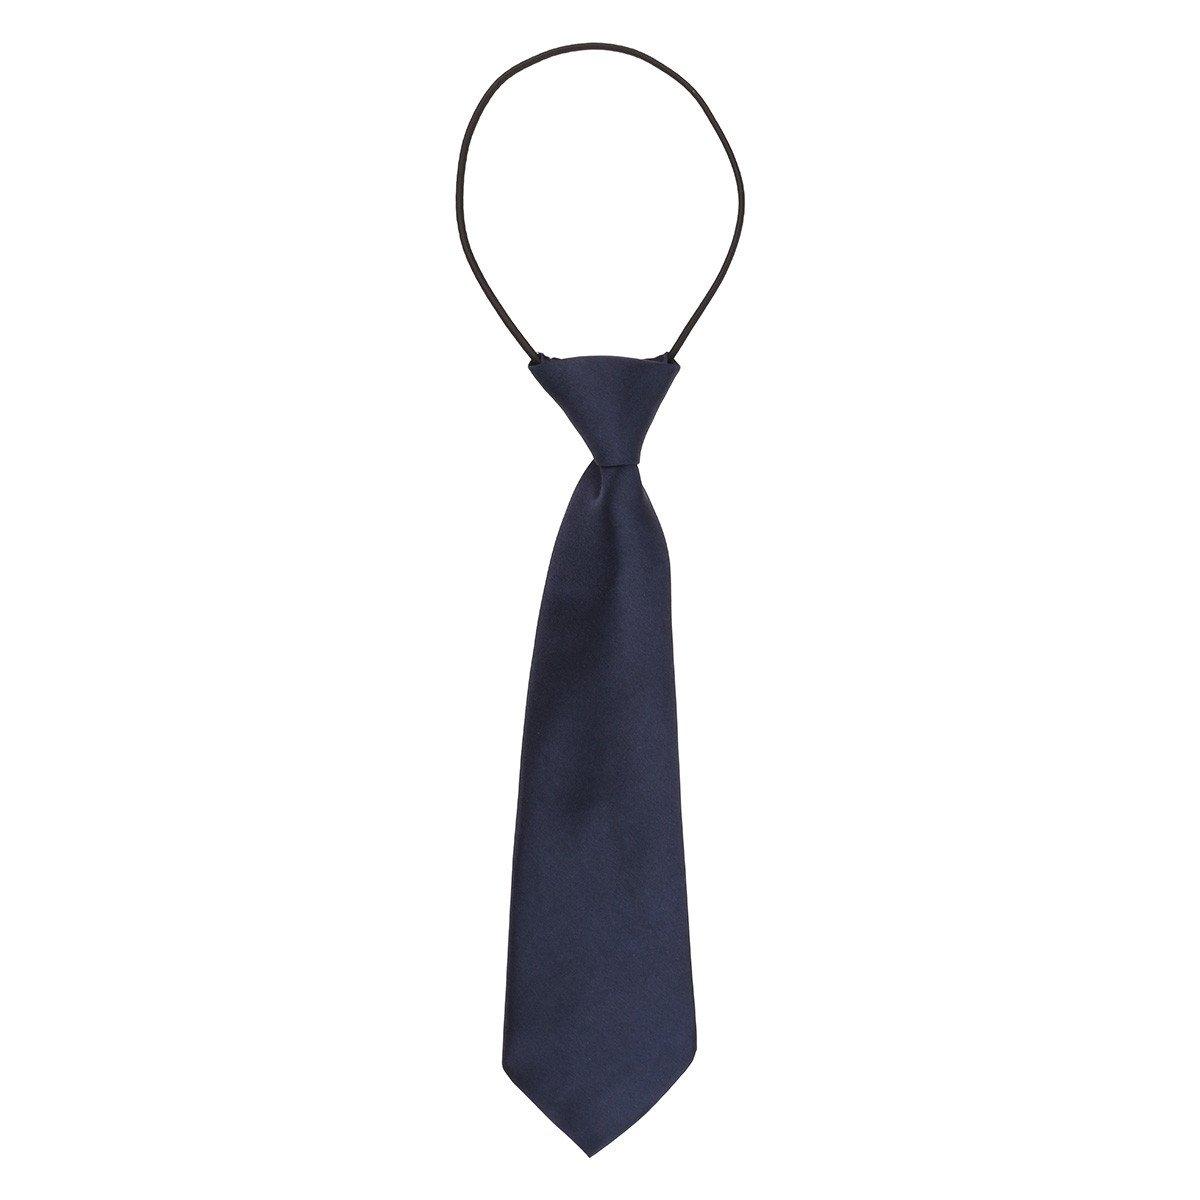 iiniim Kids School Boys Adjustable Solid Color Tie Birthday Party Wedding Necktie Navy Blue One Size